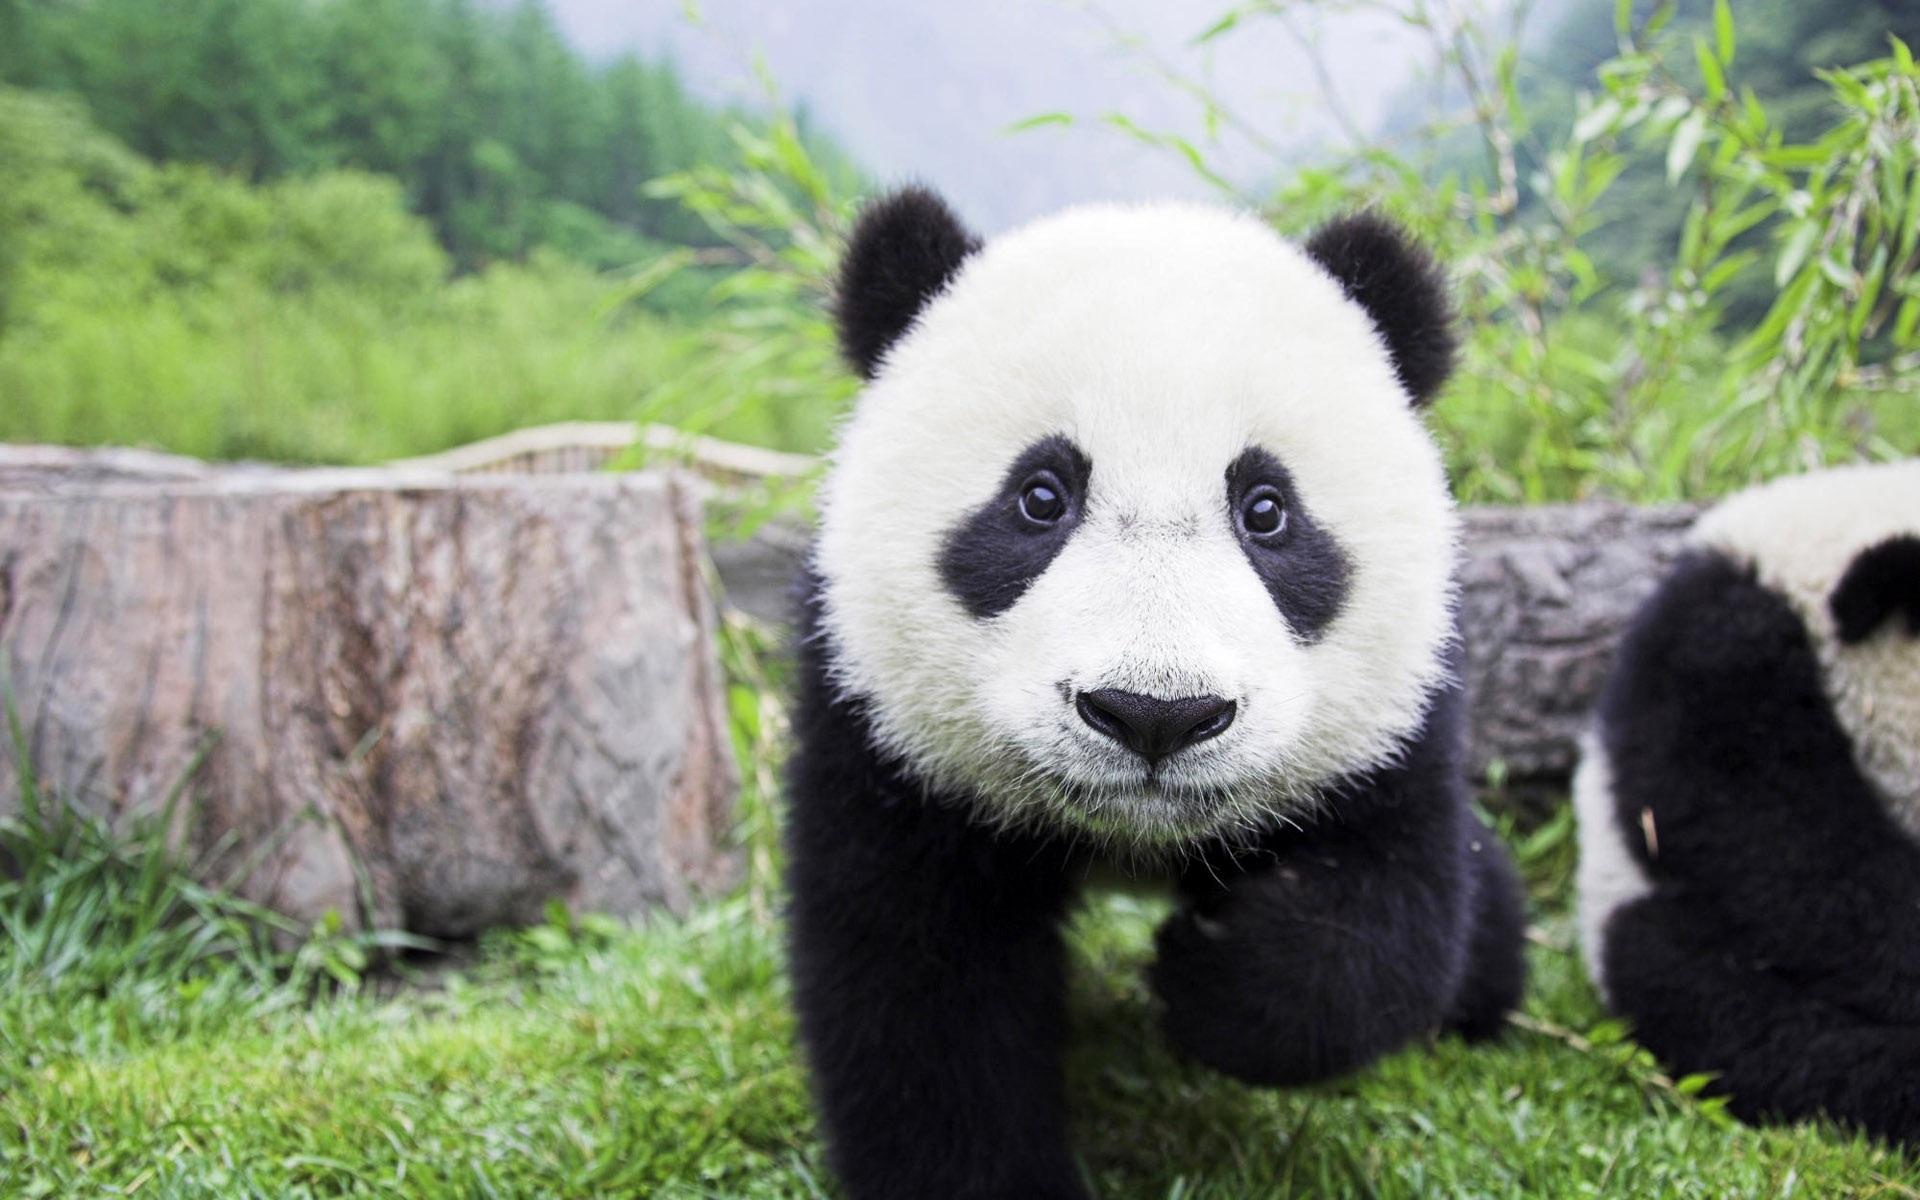 10 Best images about Cute Panda on Pinterest | Giant pandas